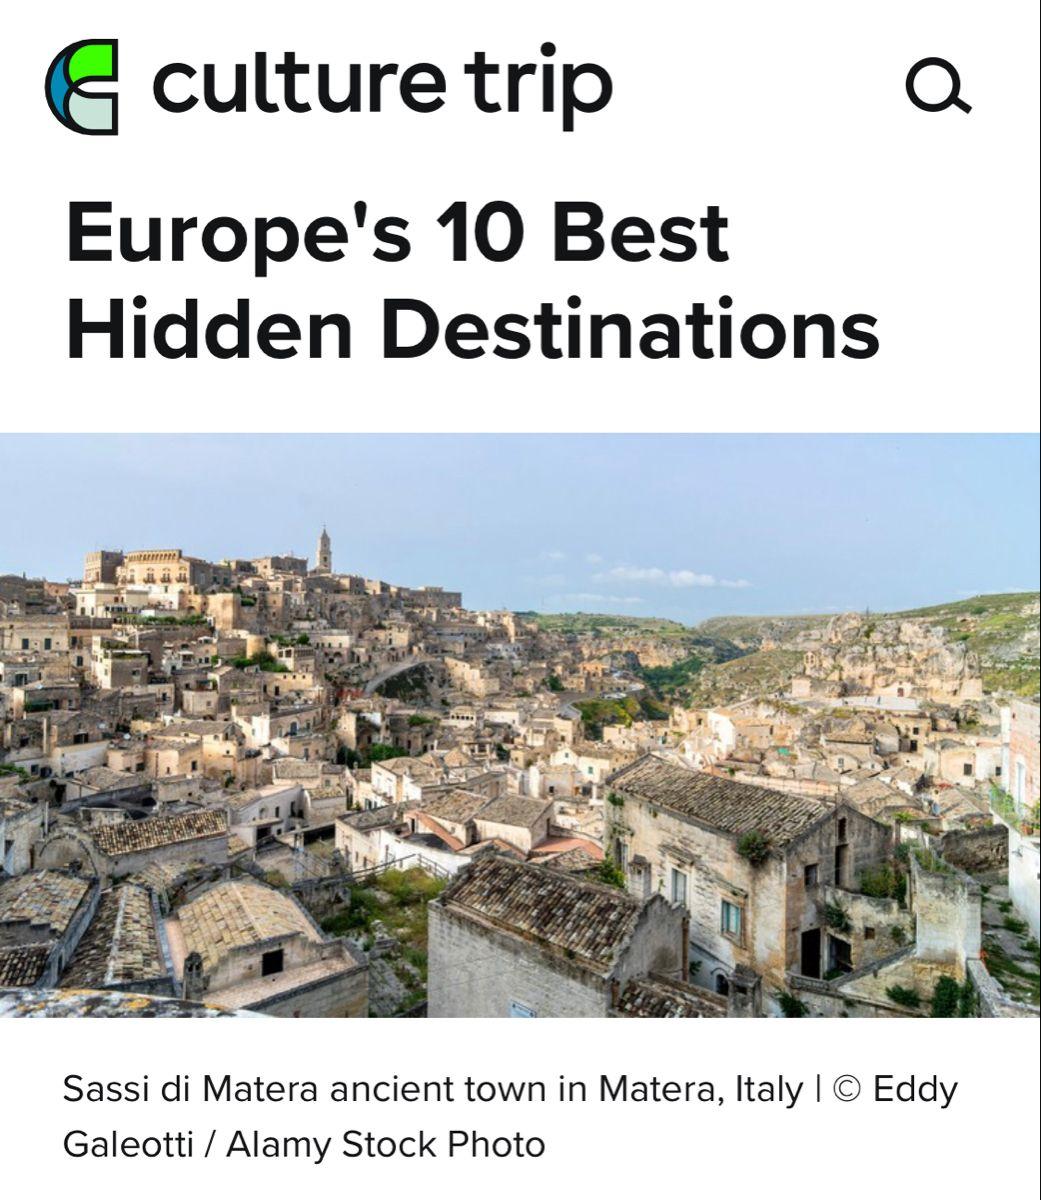 The 10 Best Hidden Destinations In Europe Cultural Destinations Trip Europe